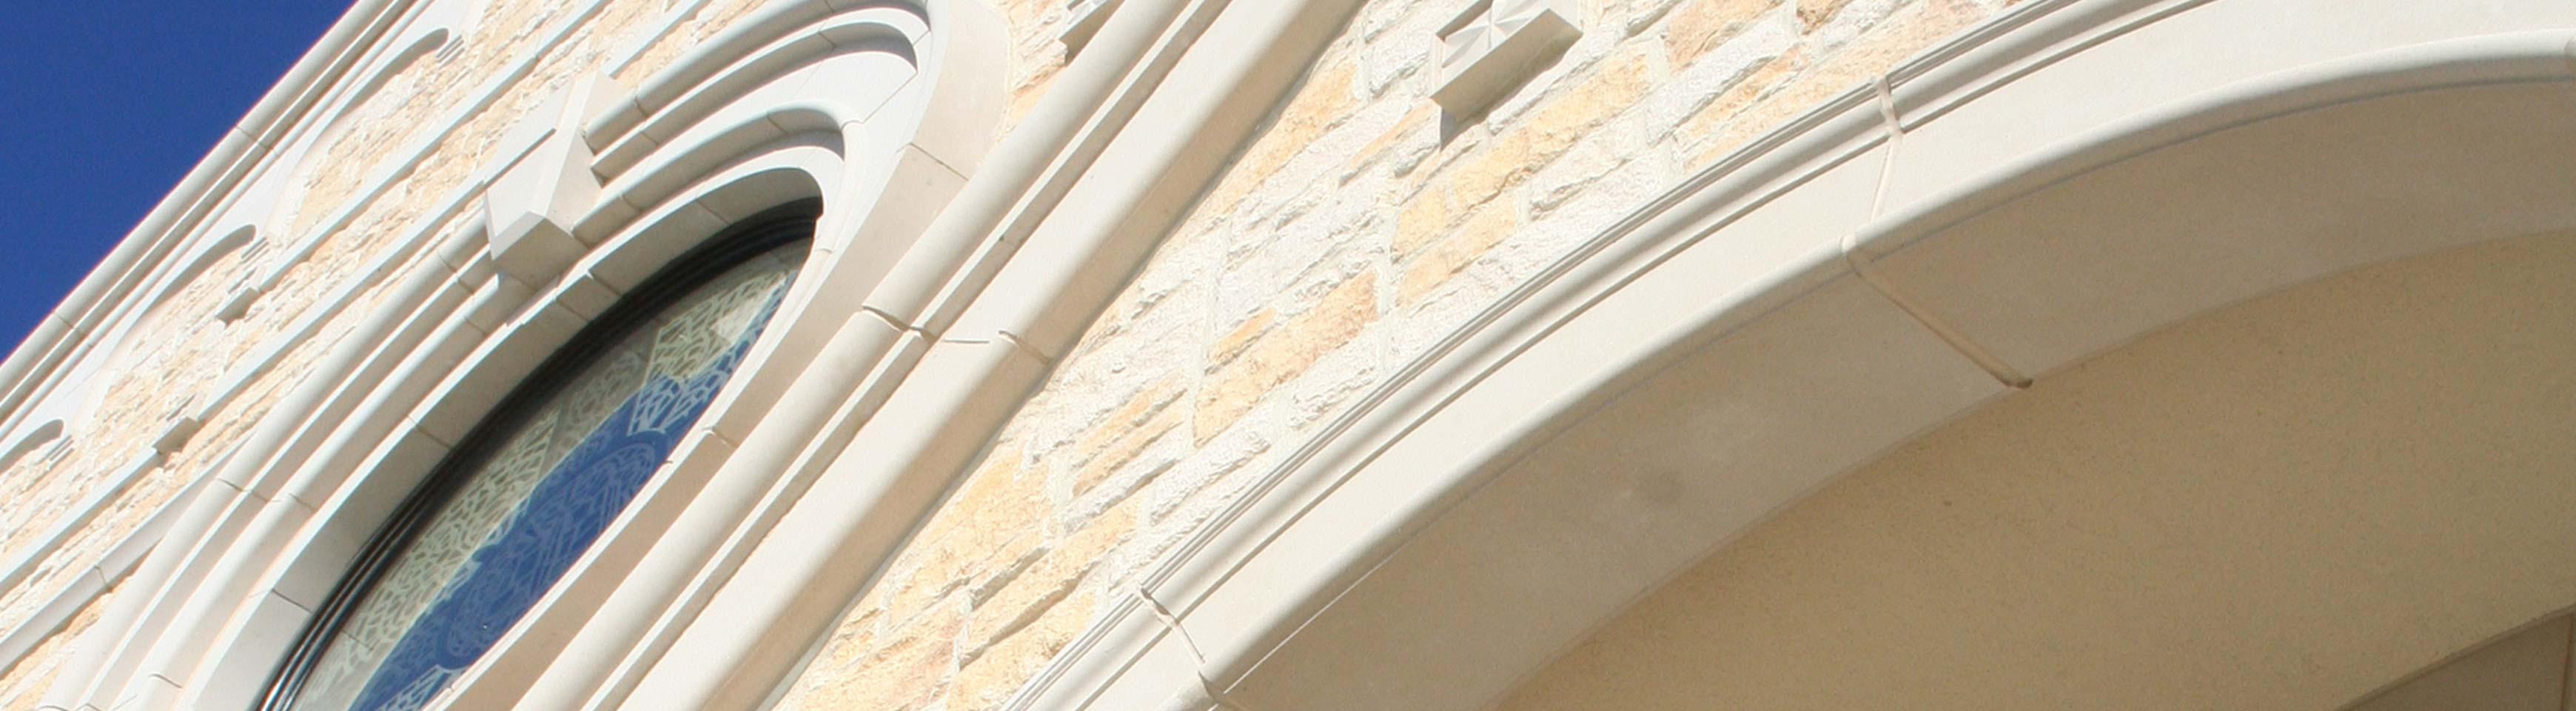 arco del edificio de la iglesia y vidriera